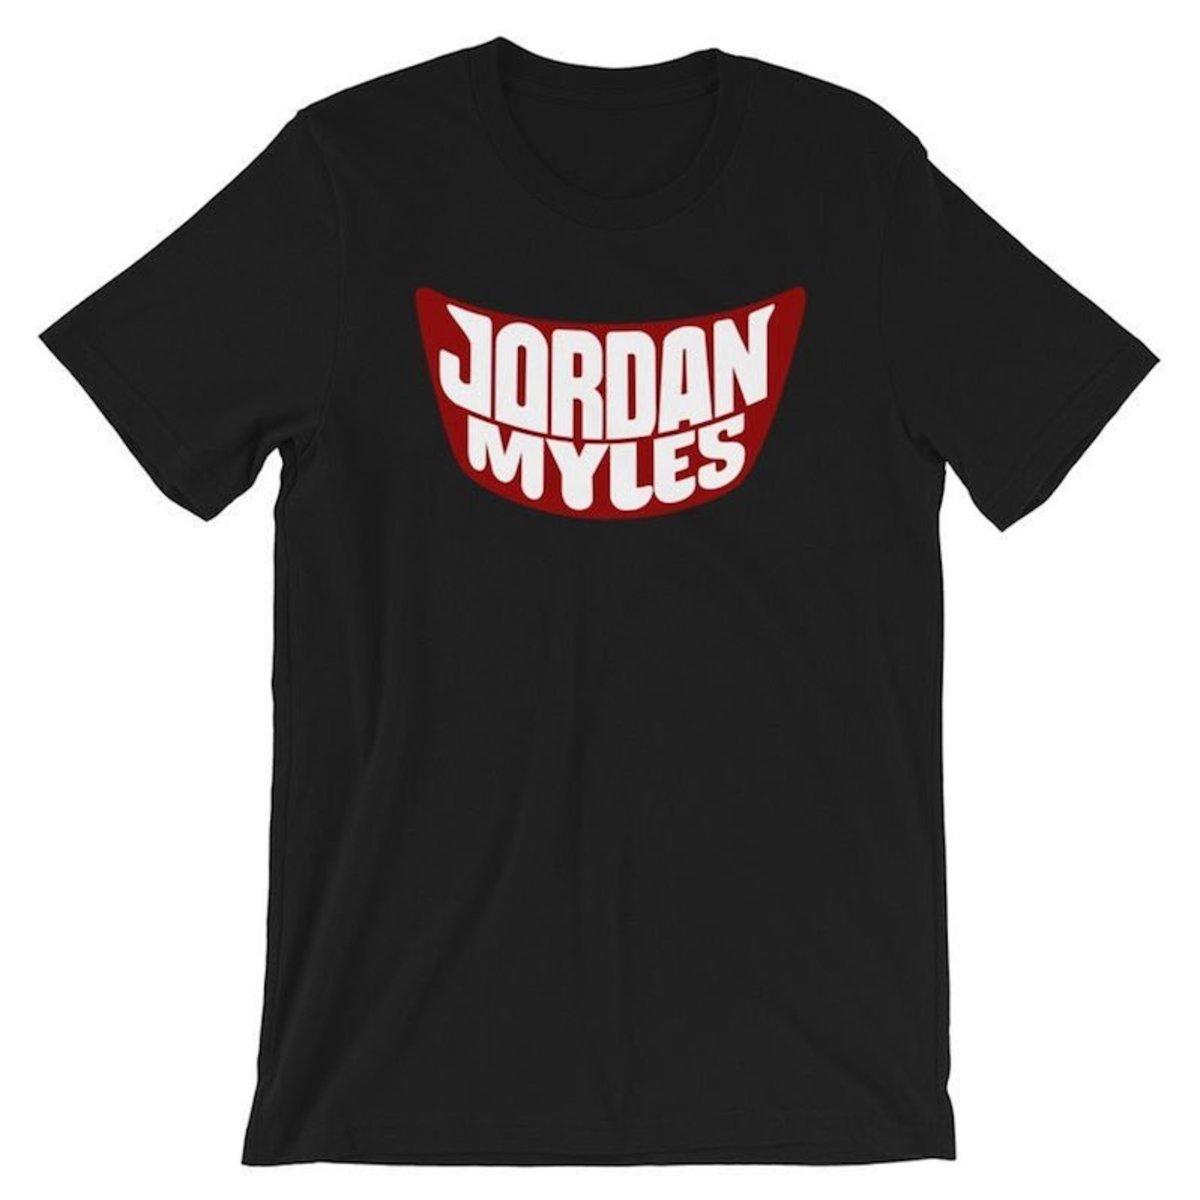 The shirt Jordan Myles decried as racist